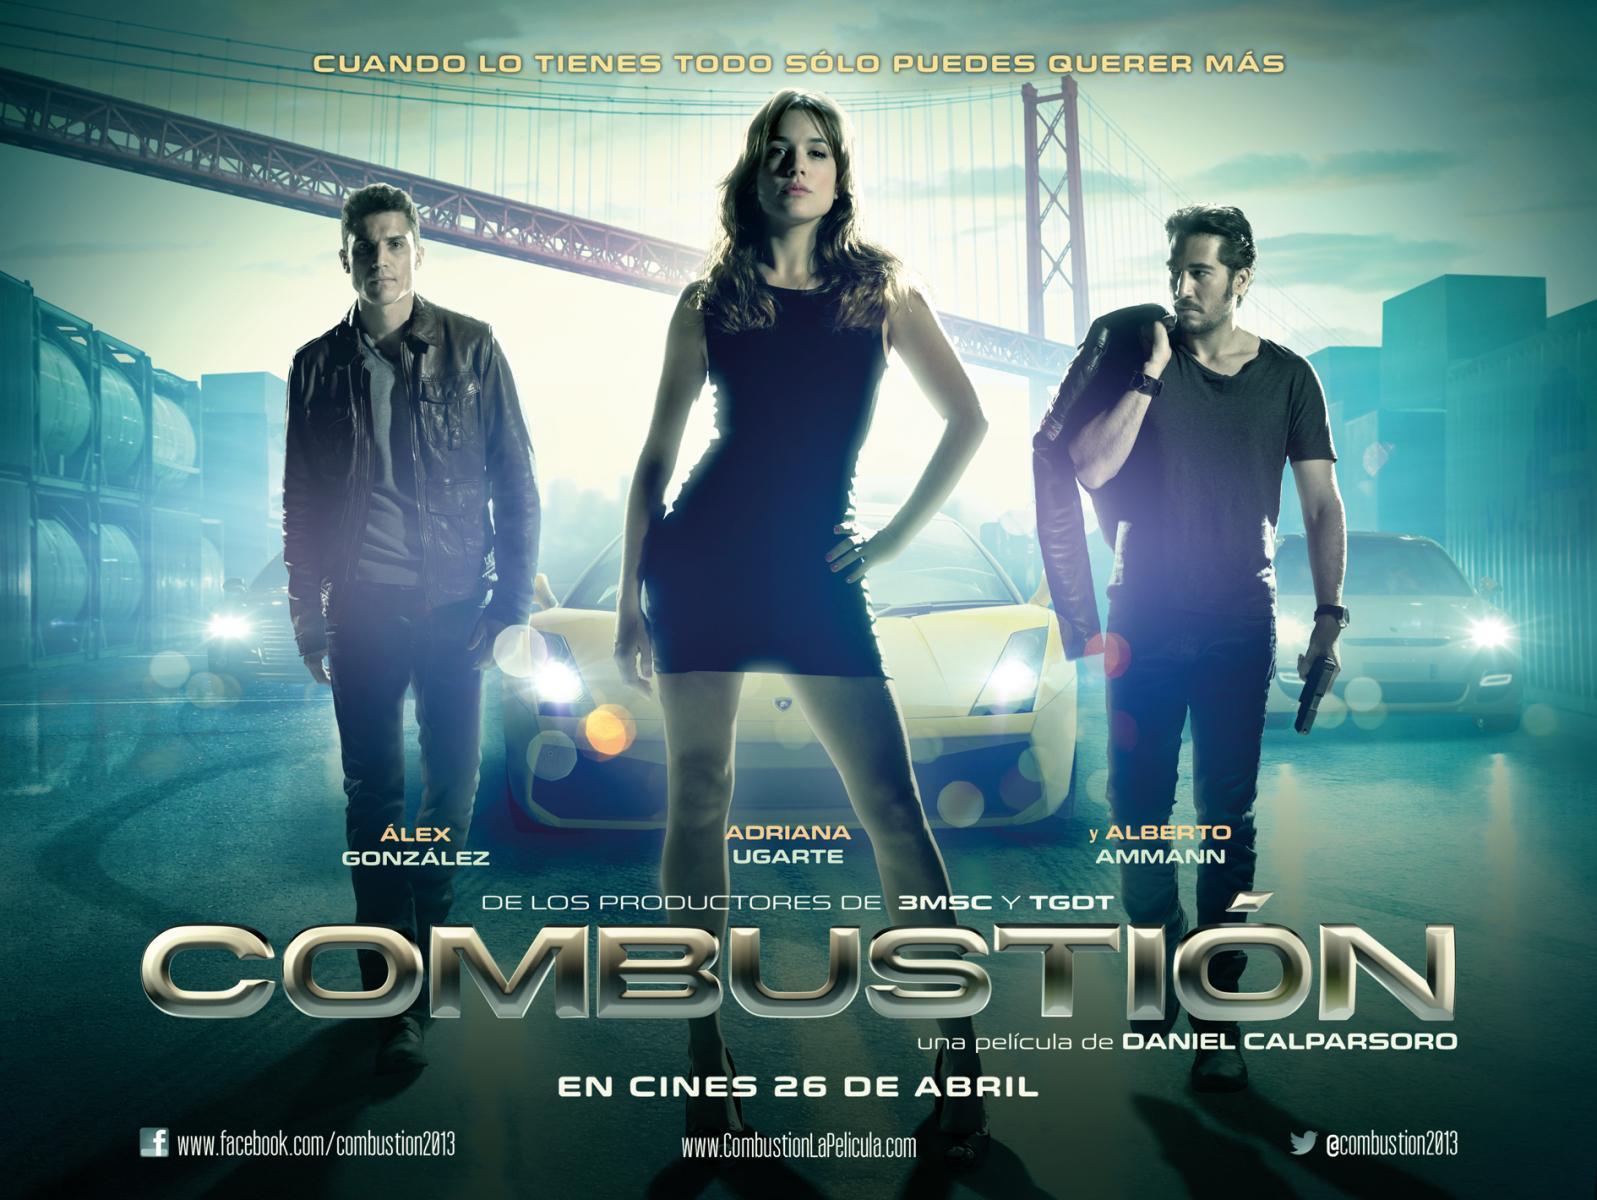 Combustion 2013 Filmaffinity